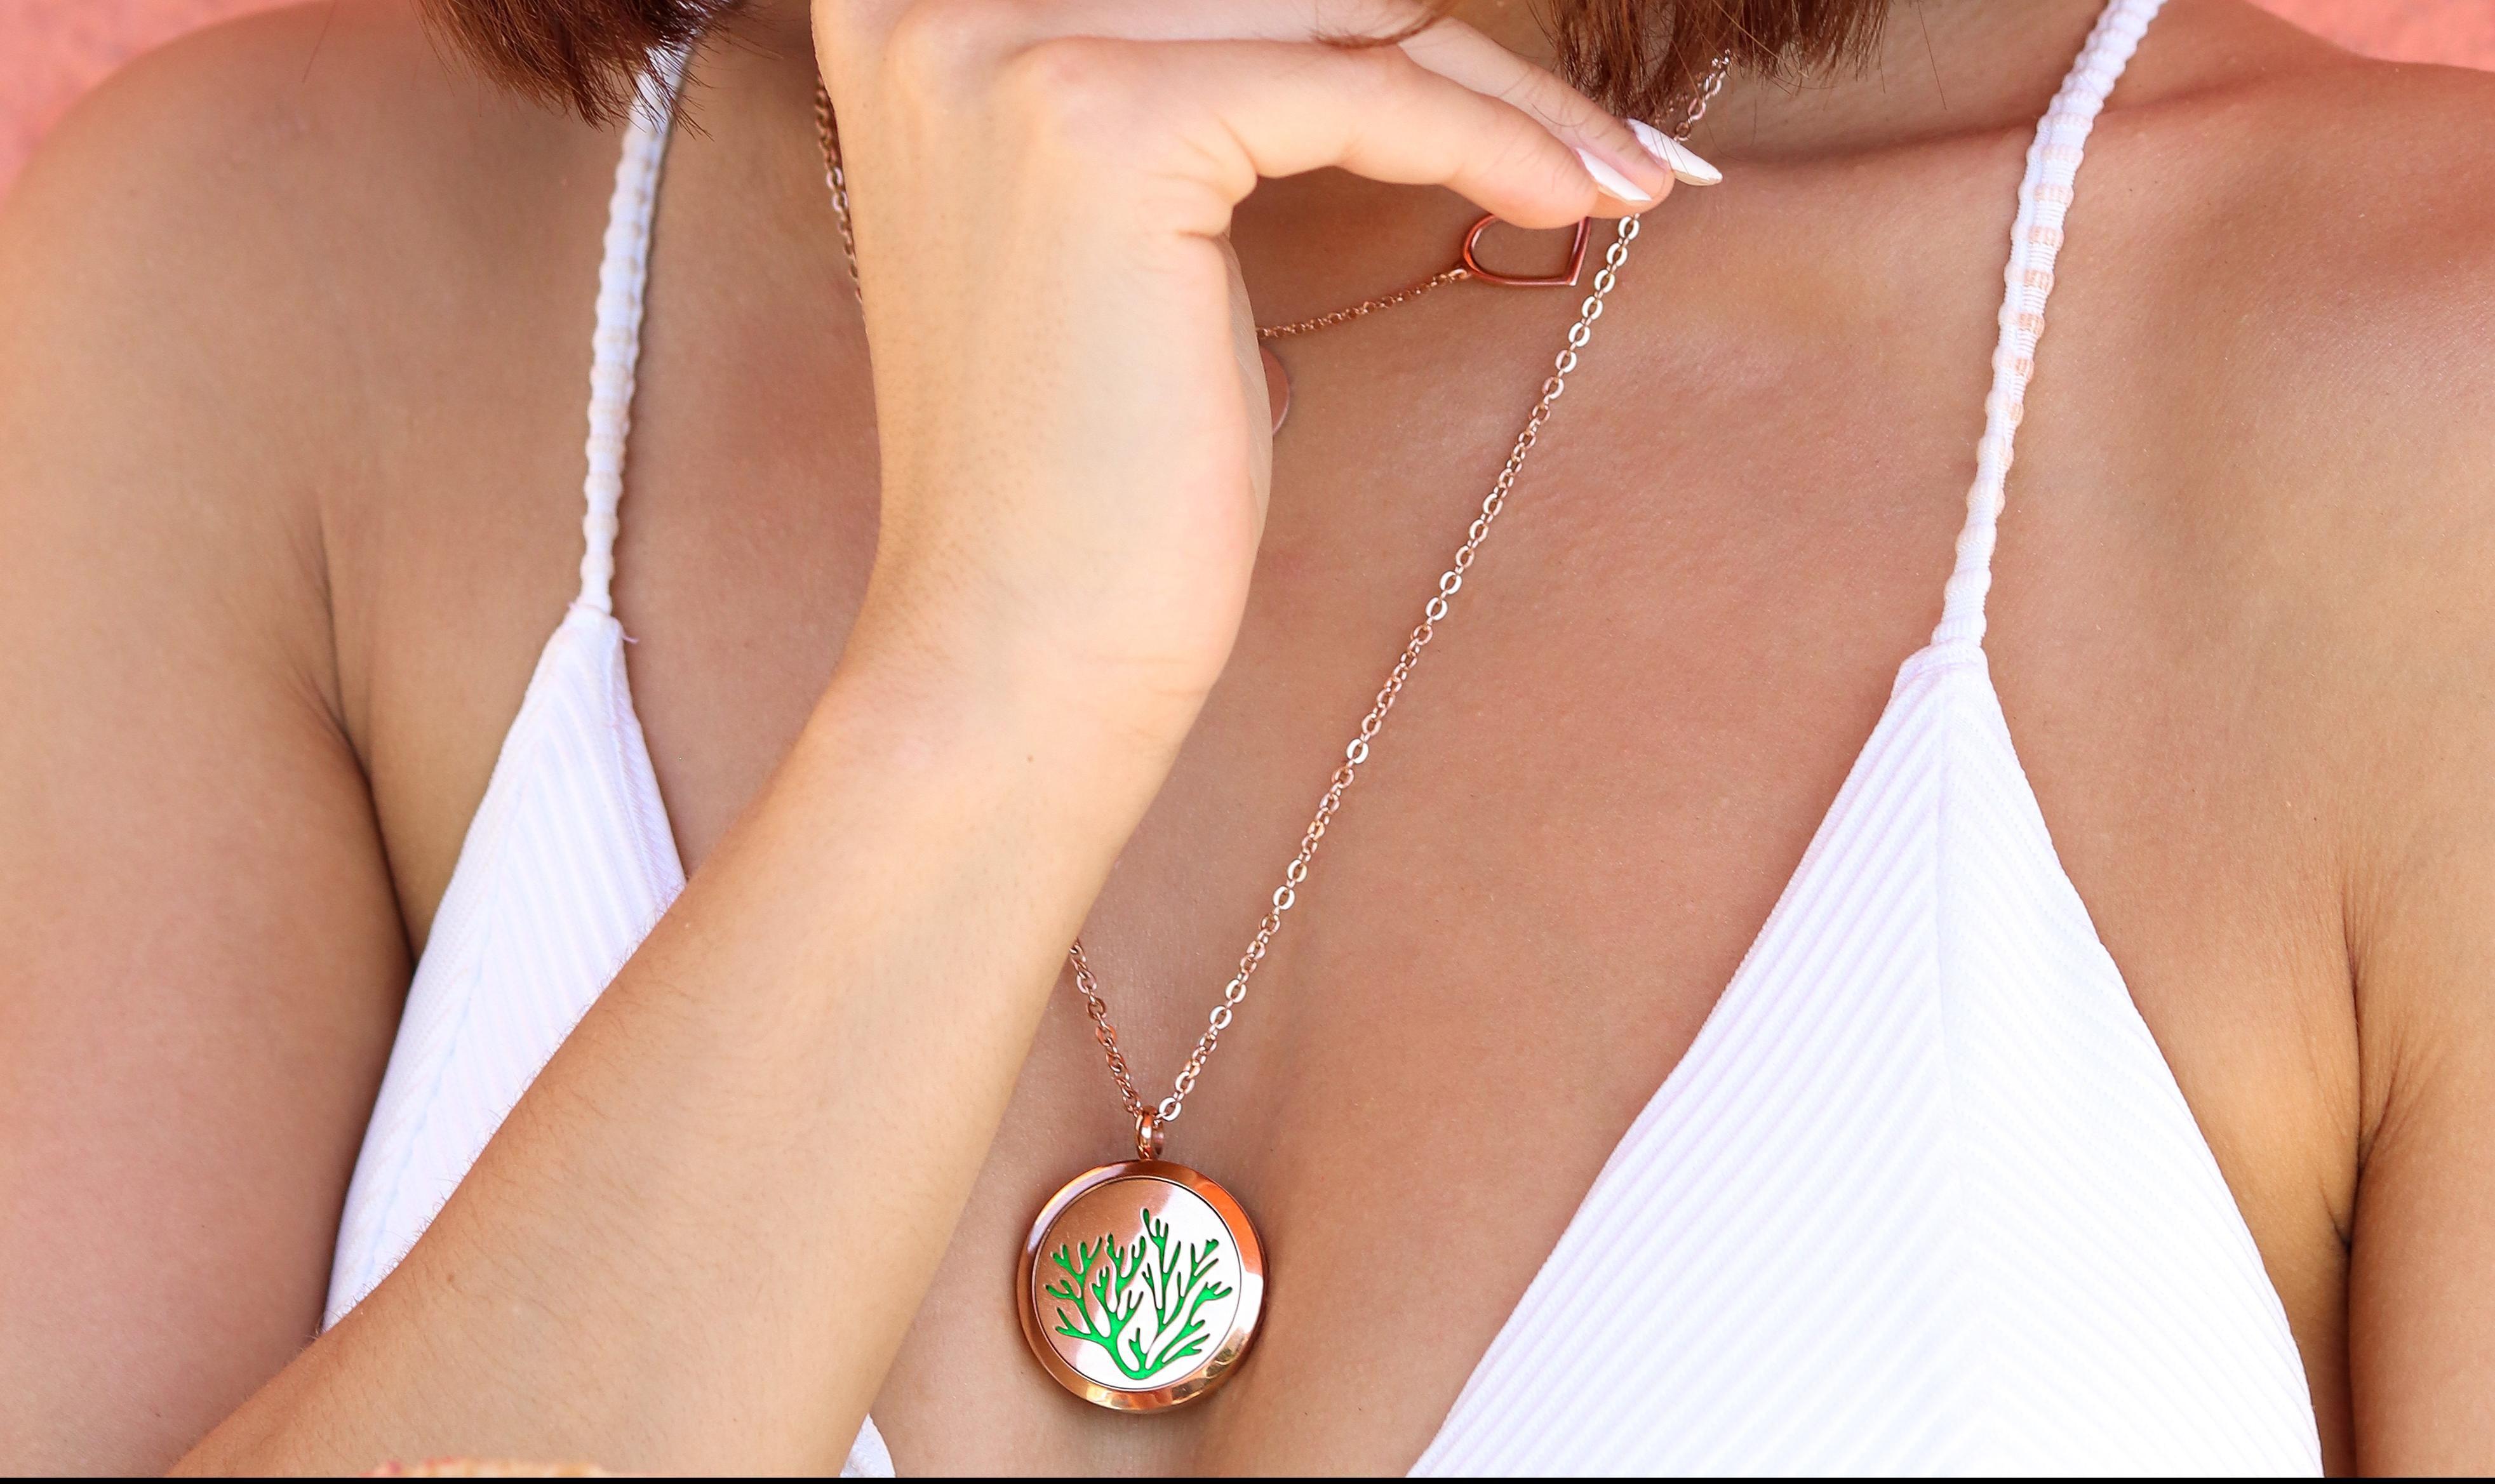 Lykke ljetna kolekcija nakita inspirirana je ljepotama Hrvatske